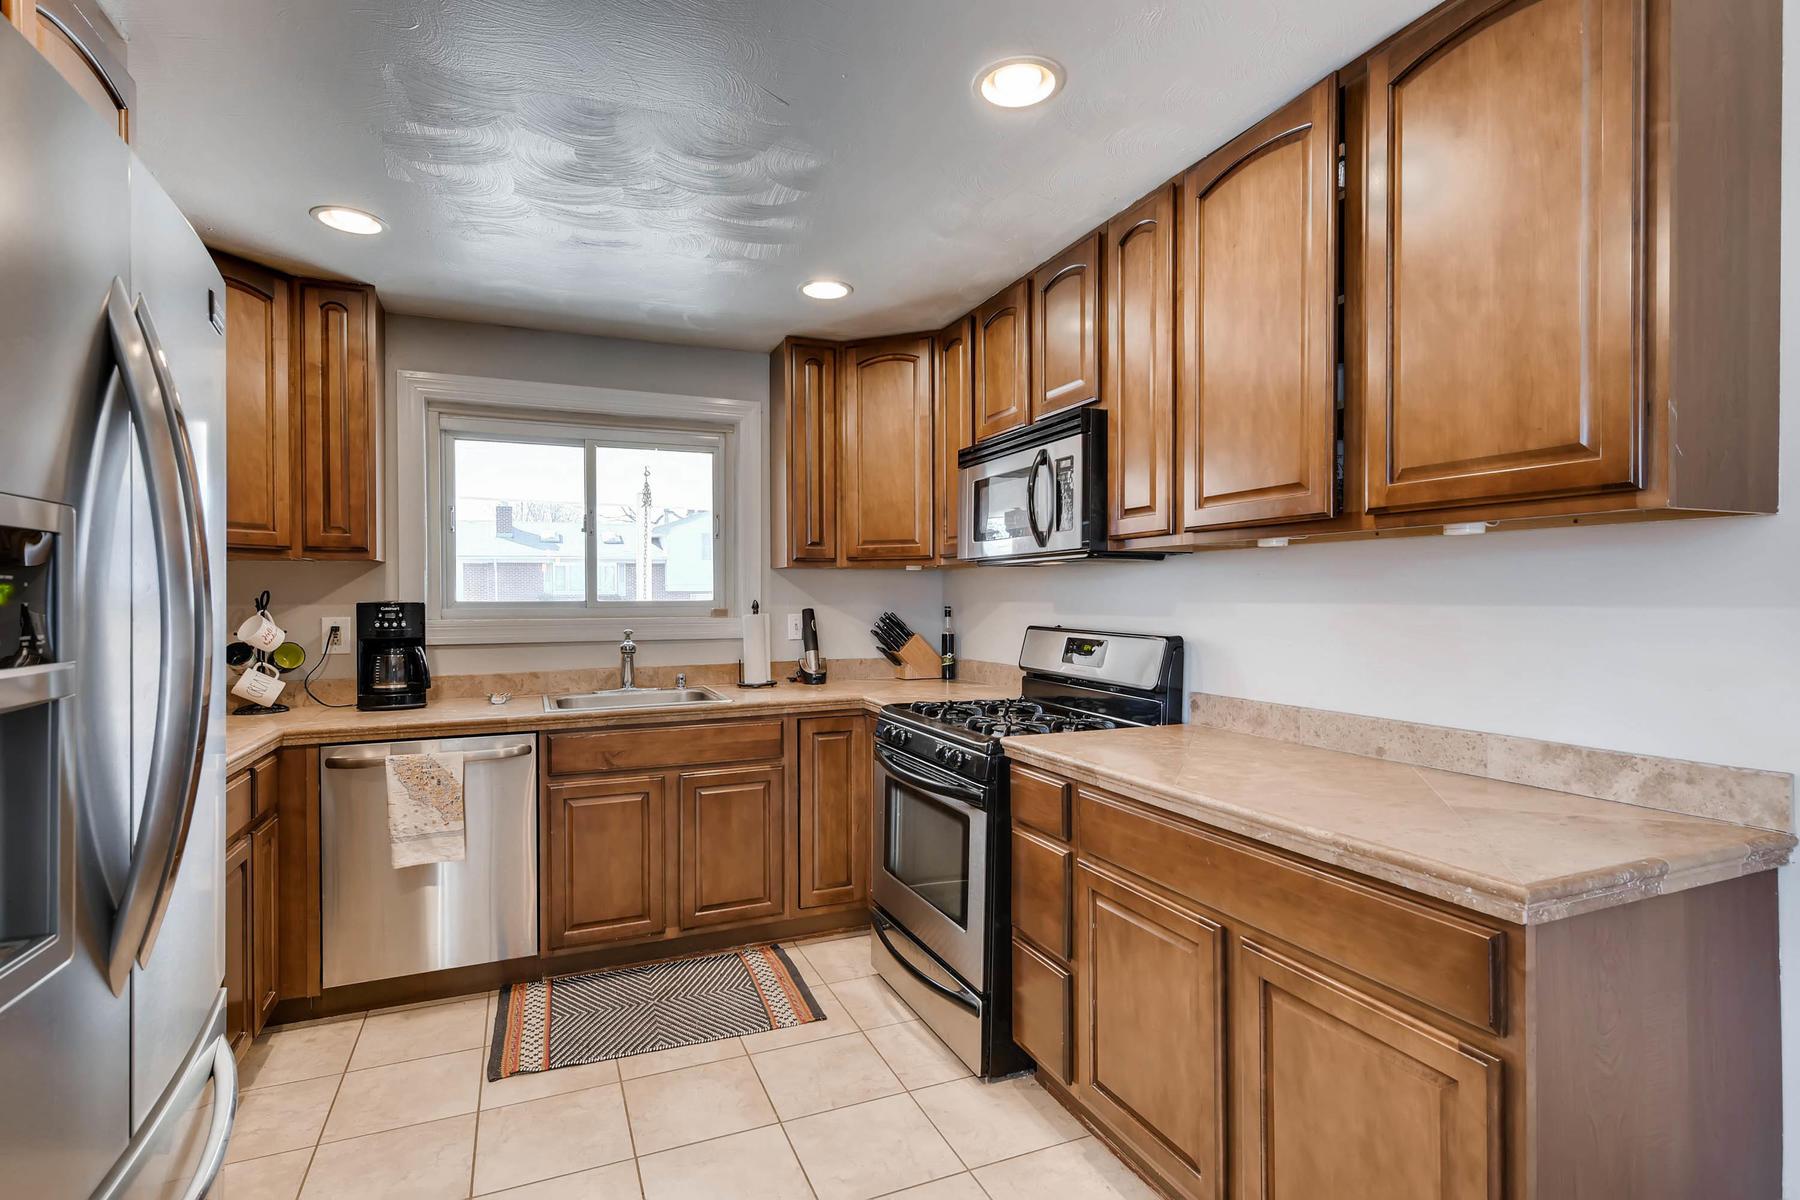 6676 S Kit Carson St-MLS_Size-008-7-Kitchen-1800x1200-72dpi.jpg